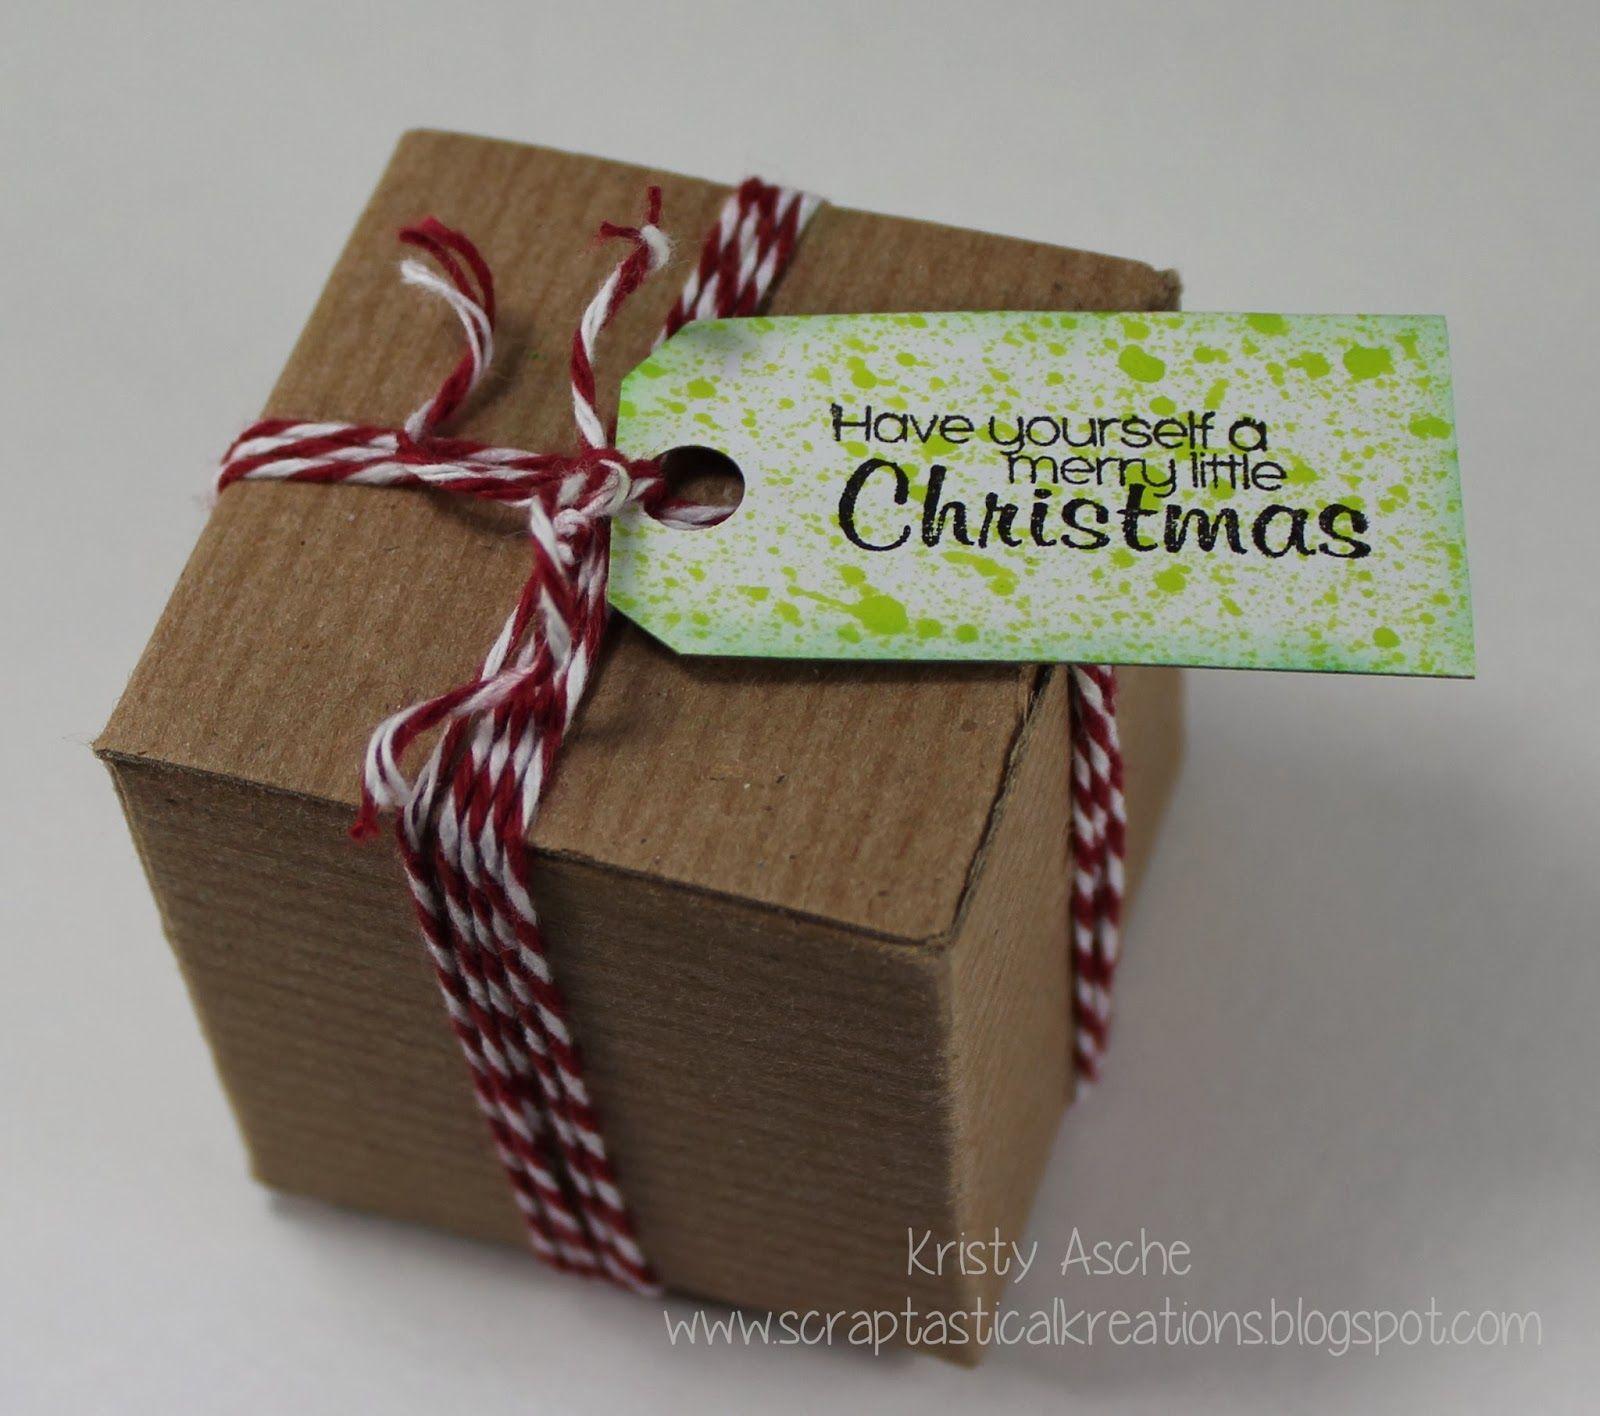 Bella Creations gift box Kristy Asche Scraptastical Kreations